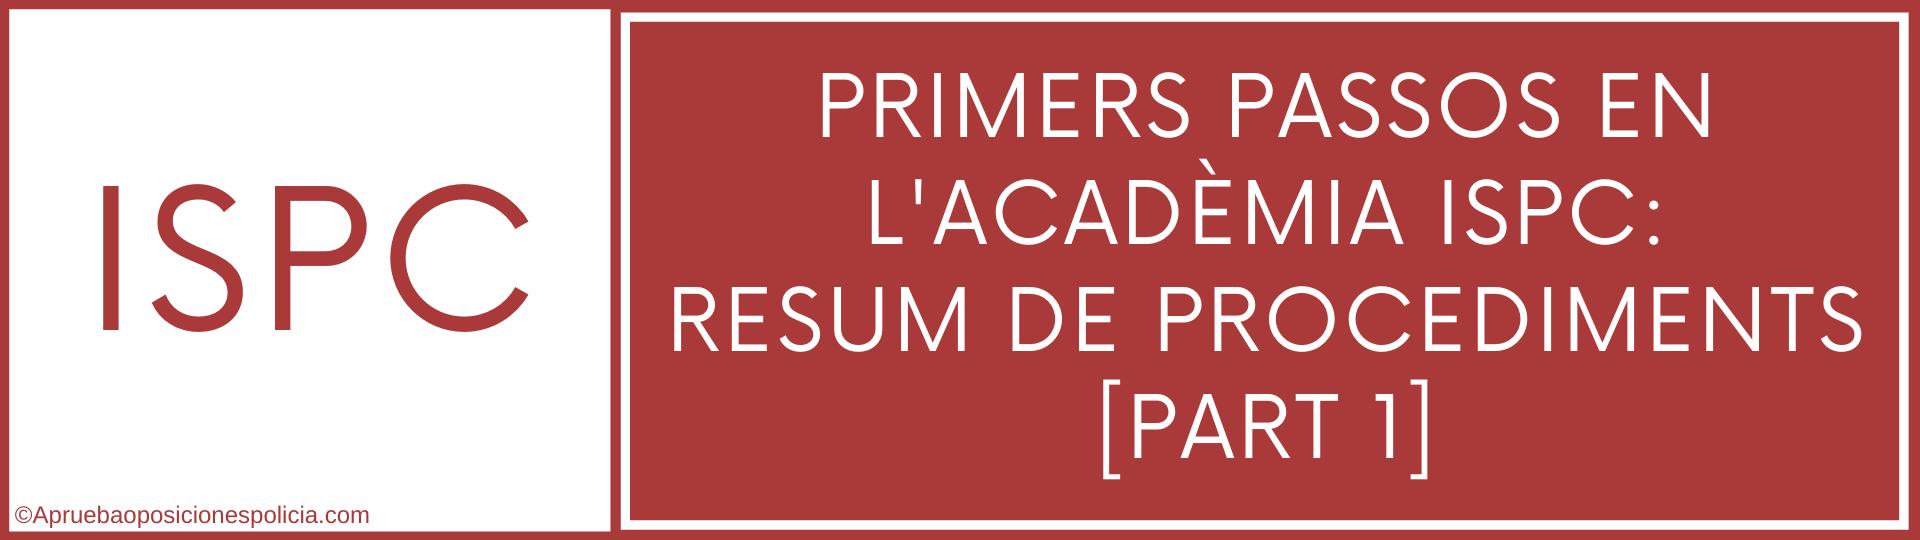 Academia ISPC procediments EPC